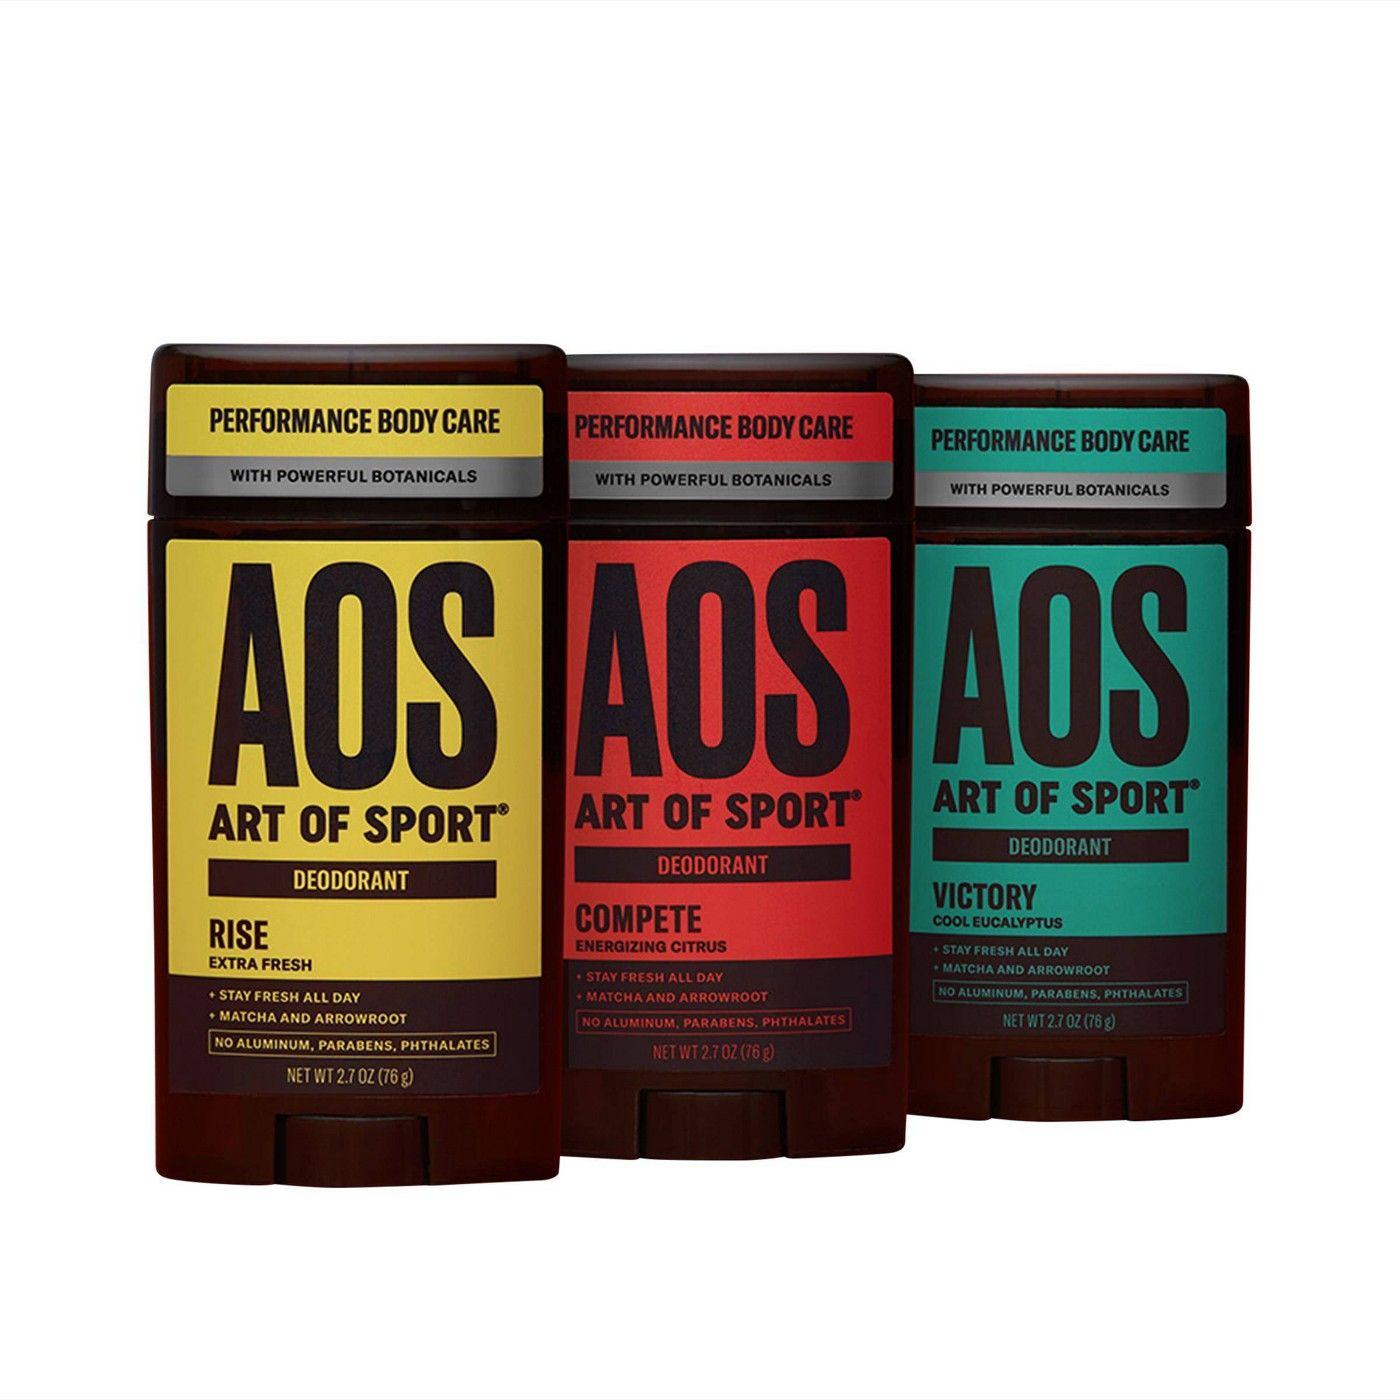 Art of Sport Victory Men's Deodorant 2.7oz Sponsored